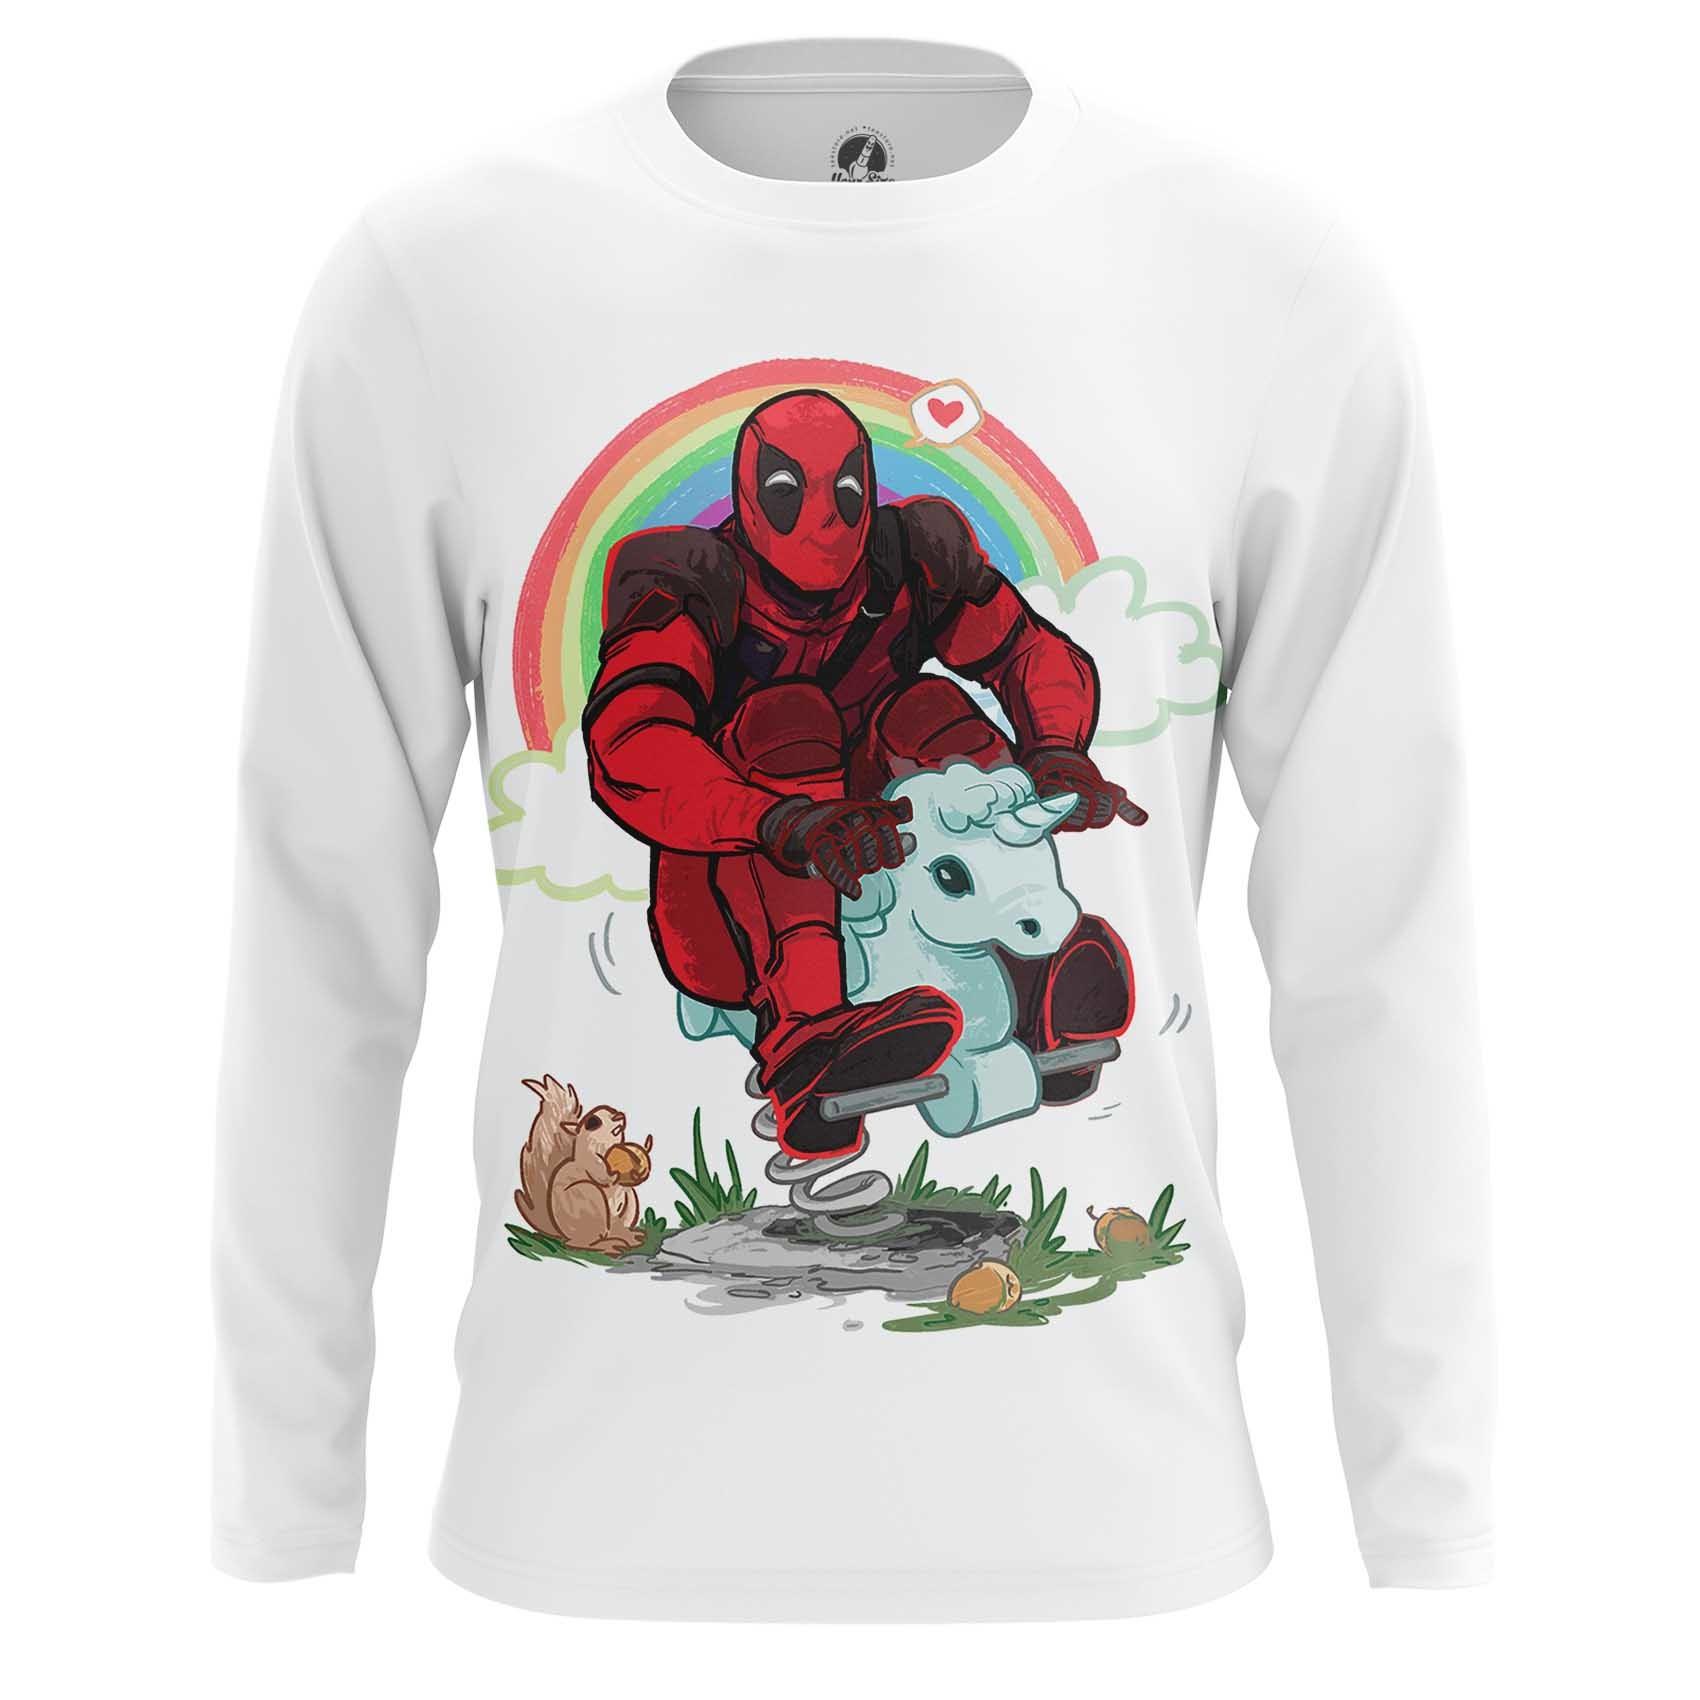 Merch Men'S T-Shirt Deadpool Rainbow Unicorn